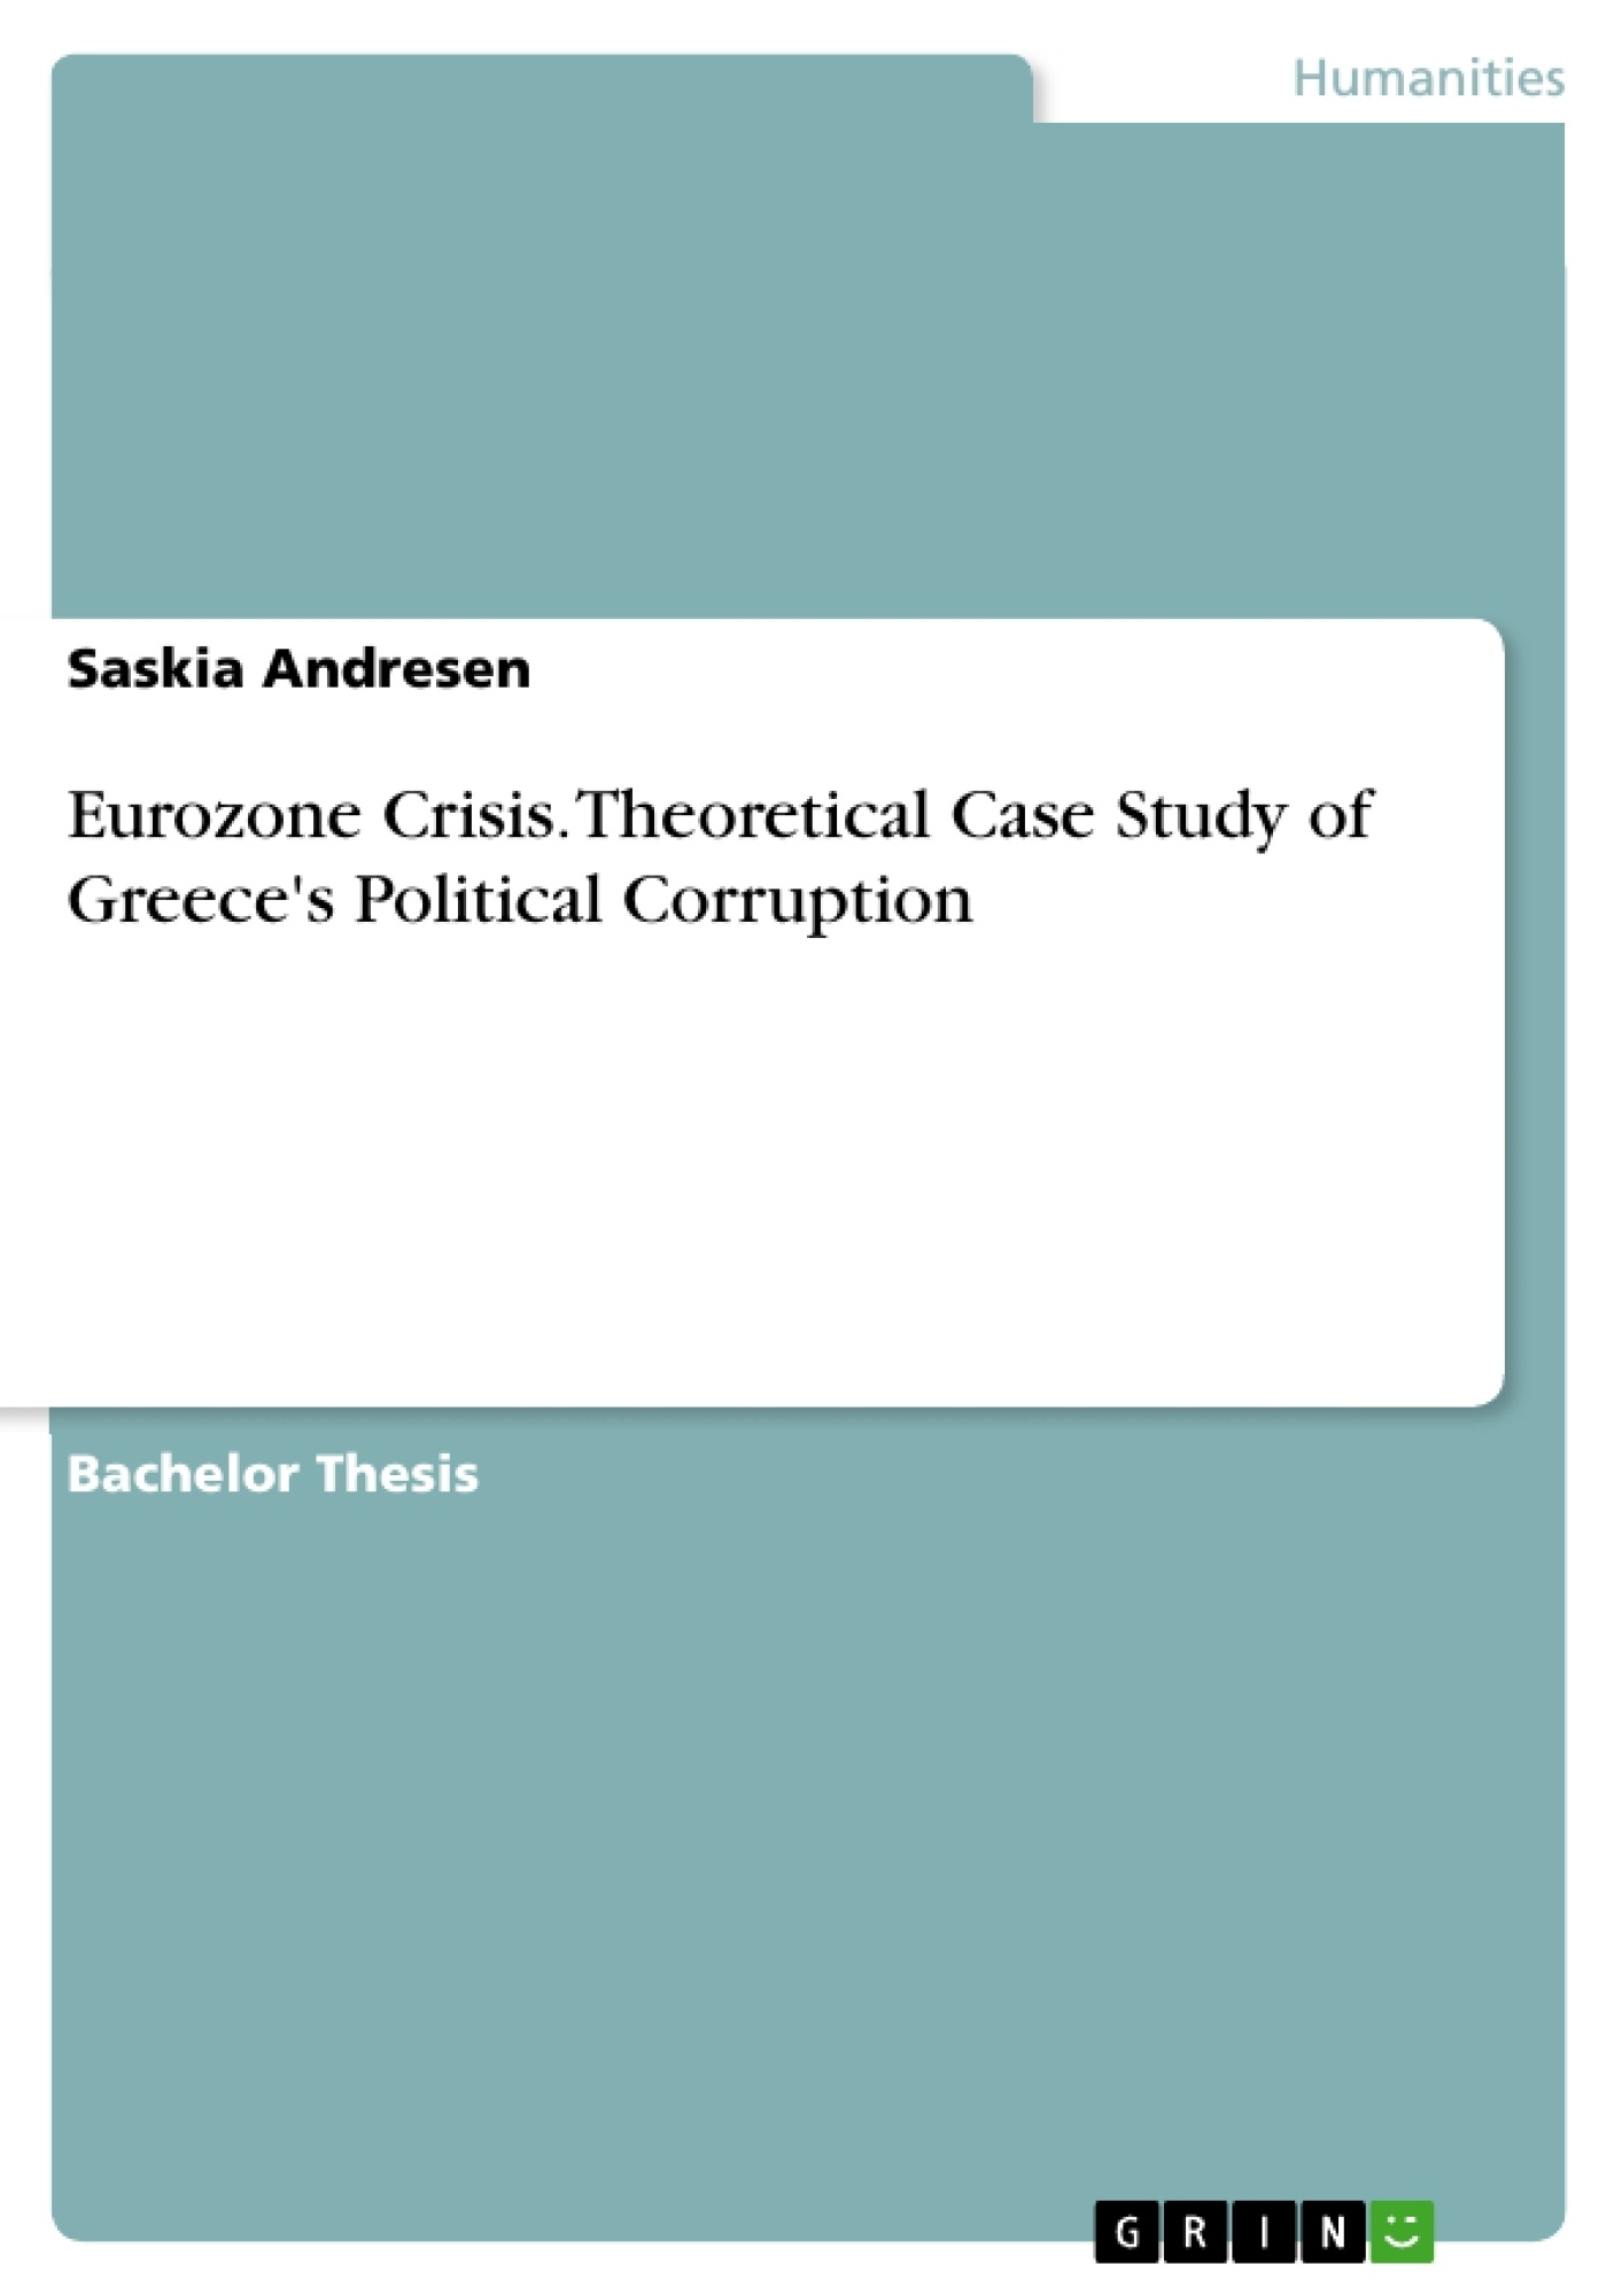 Title: Eurozone Crisis. Theoretical Case Study of Greece's Political Corruption